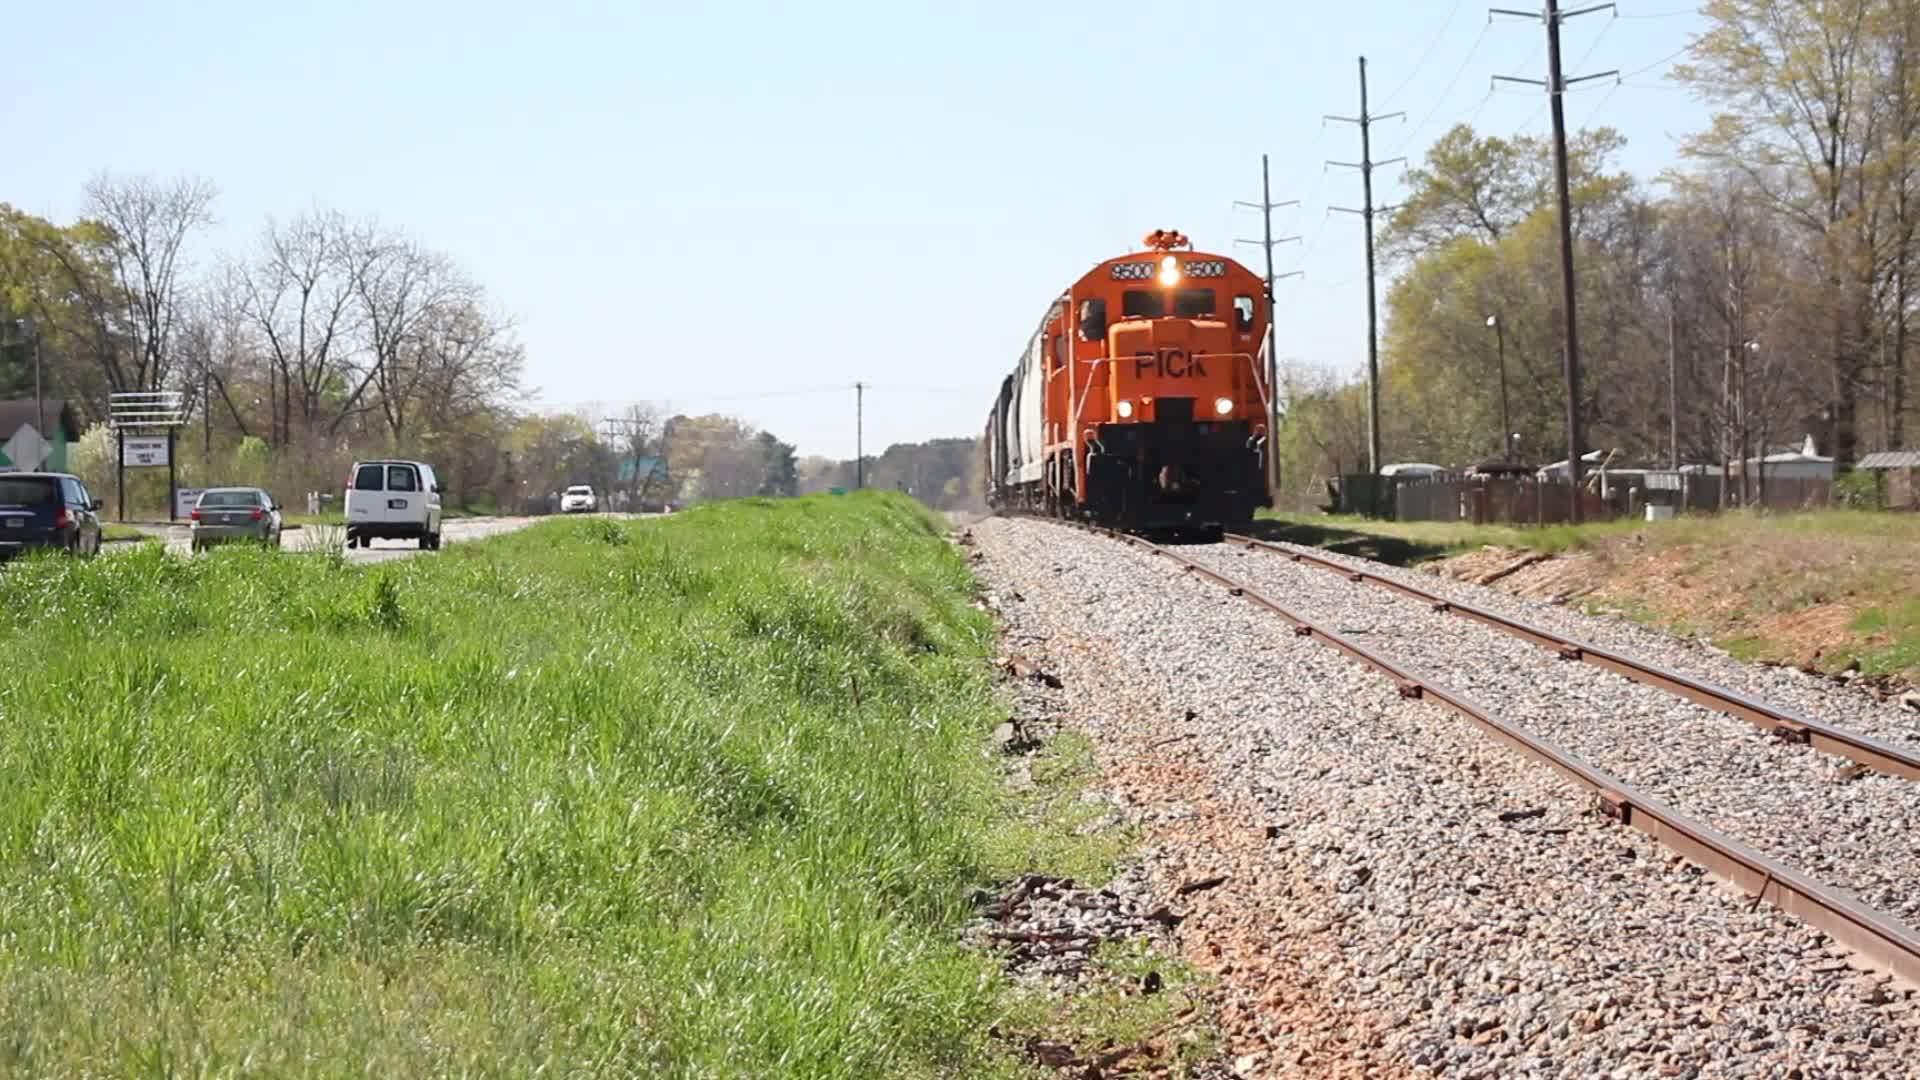 traingifs, Pickens Railway in SC GIFs